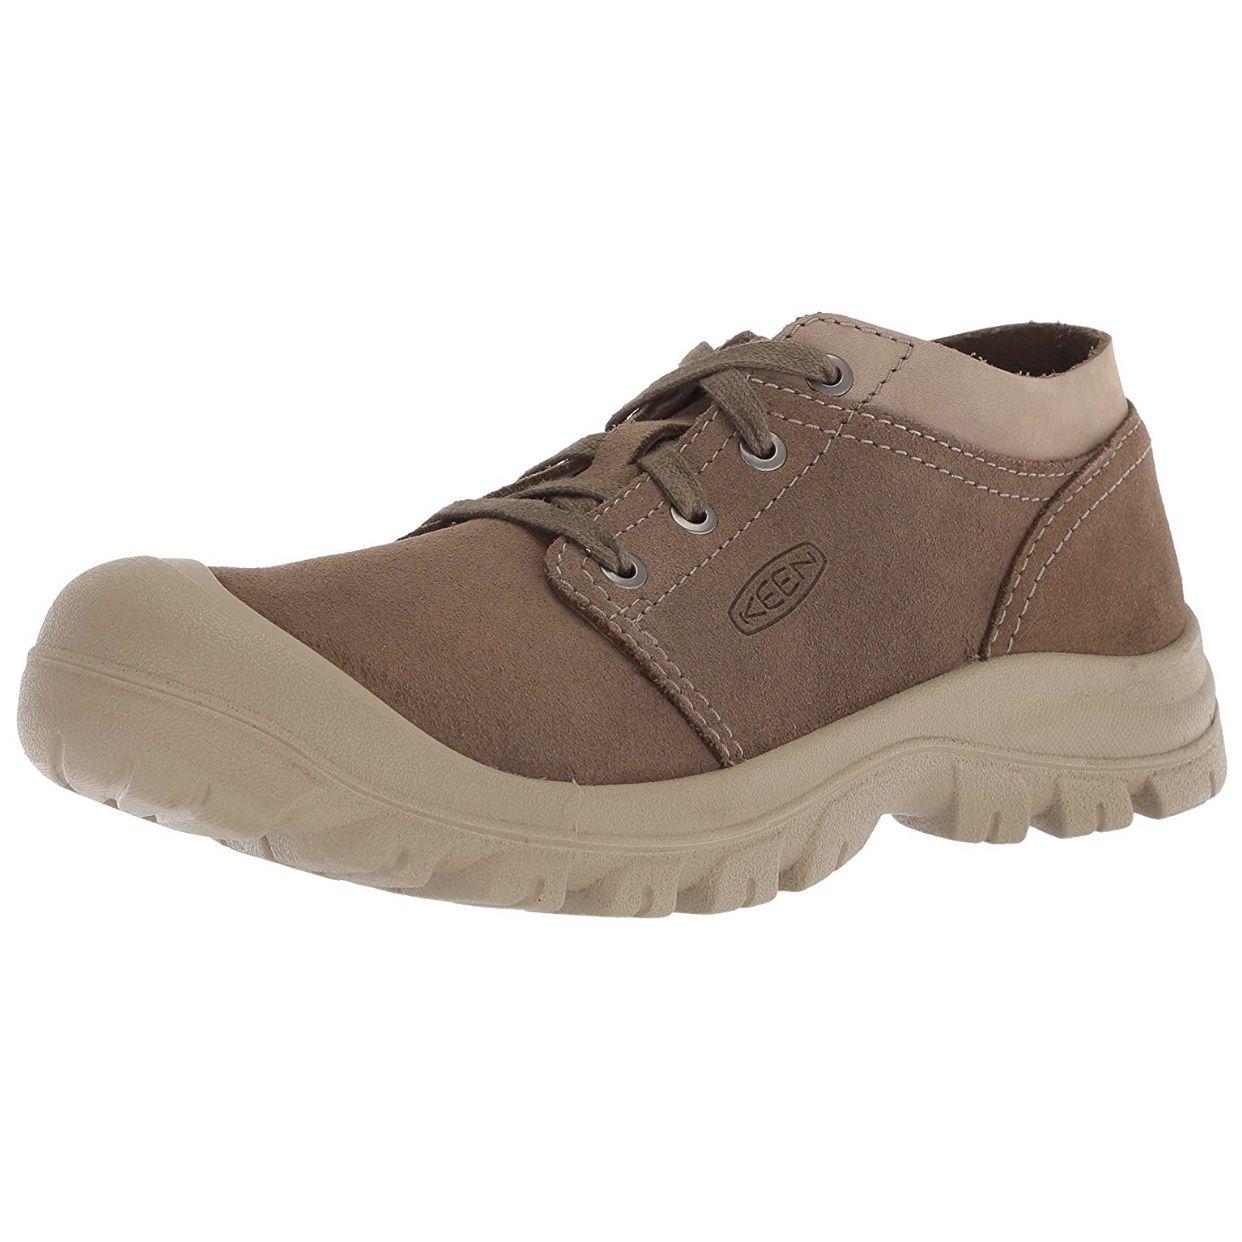 b7bb6915f9b2aa Keen Grayson Oxford-M Sage/Lama Sketchers, Sage, Oxford, Sneakers,